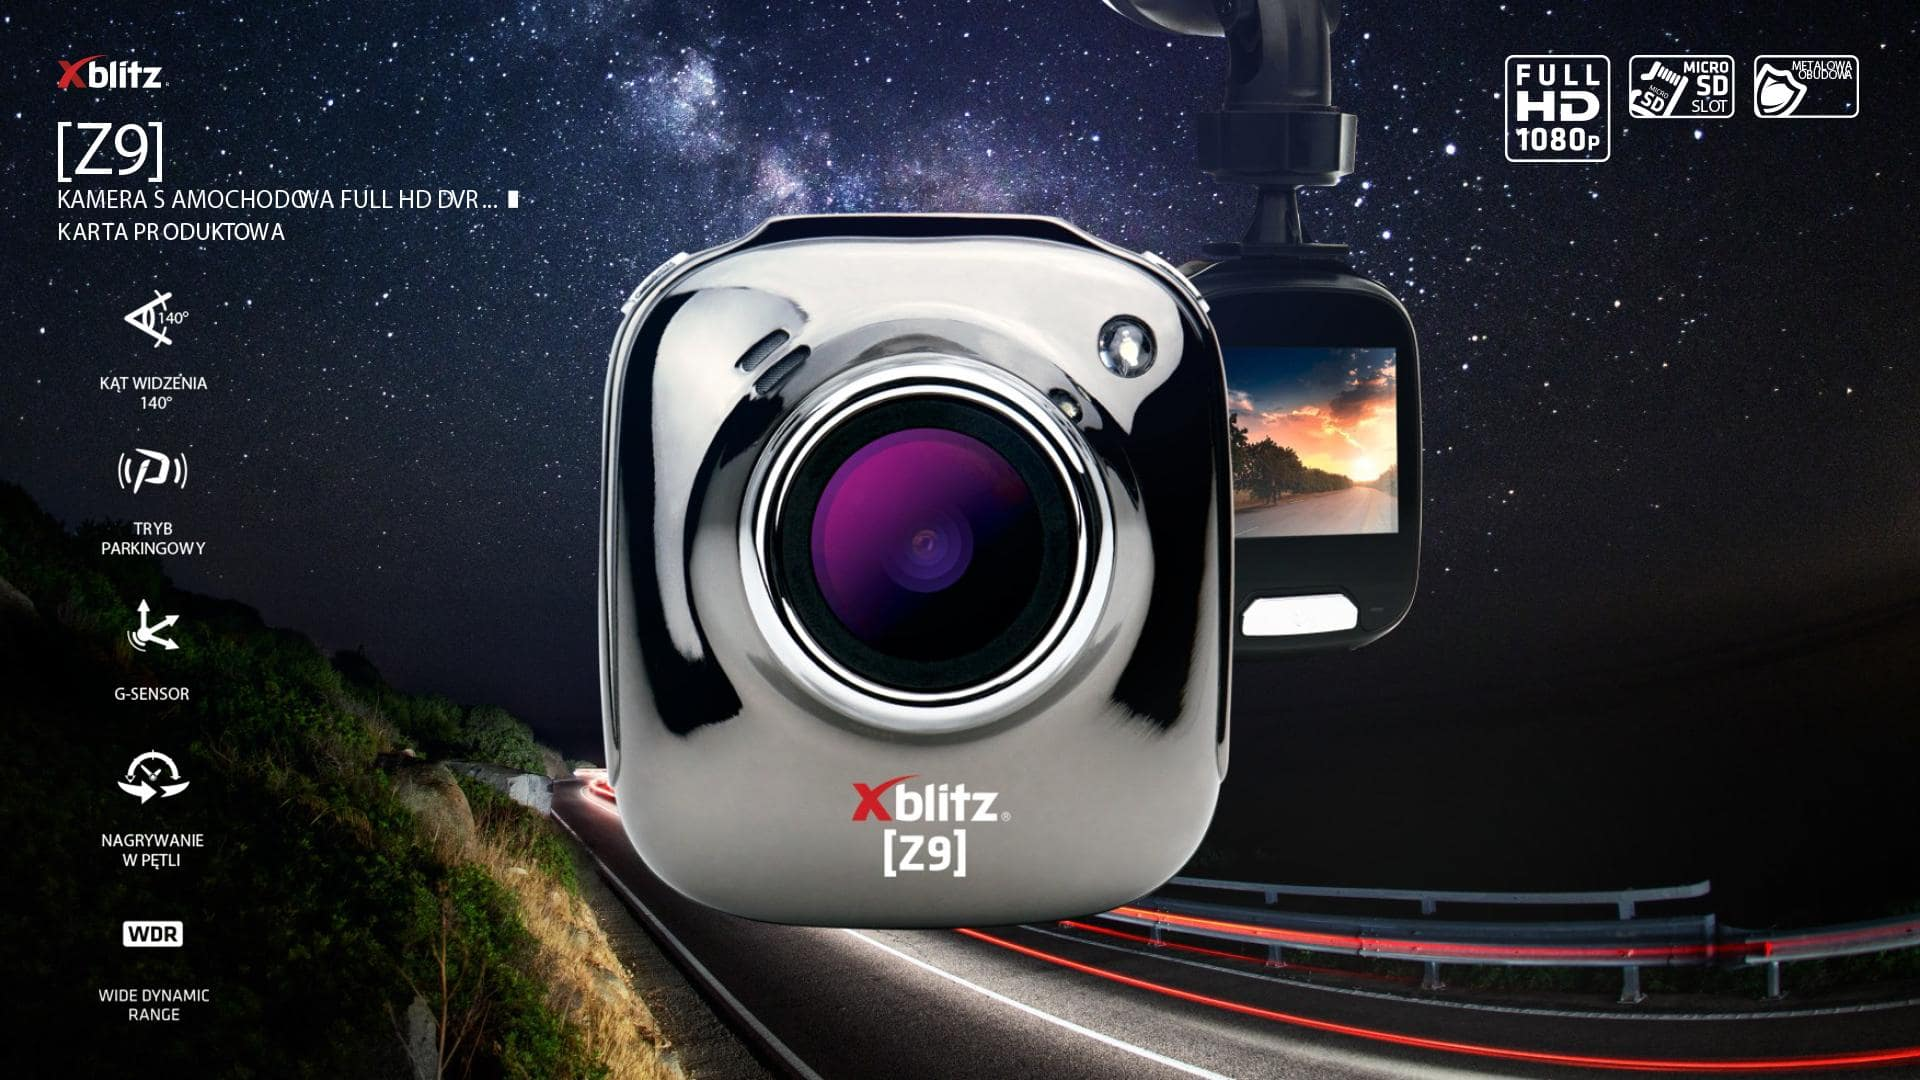 Xblitz-z9